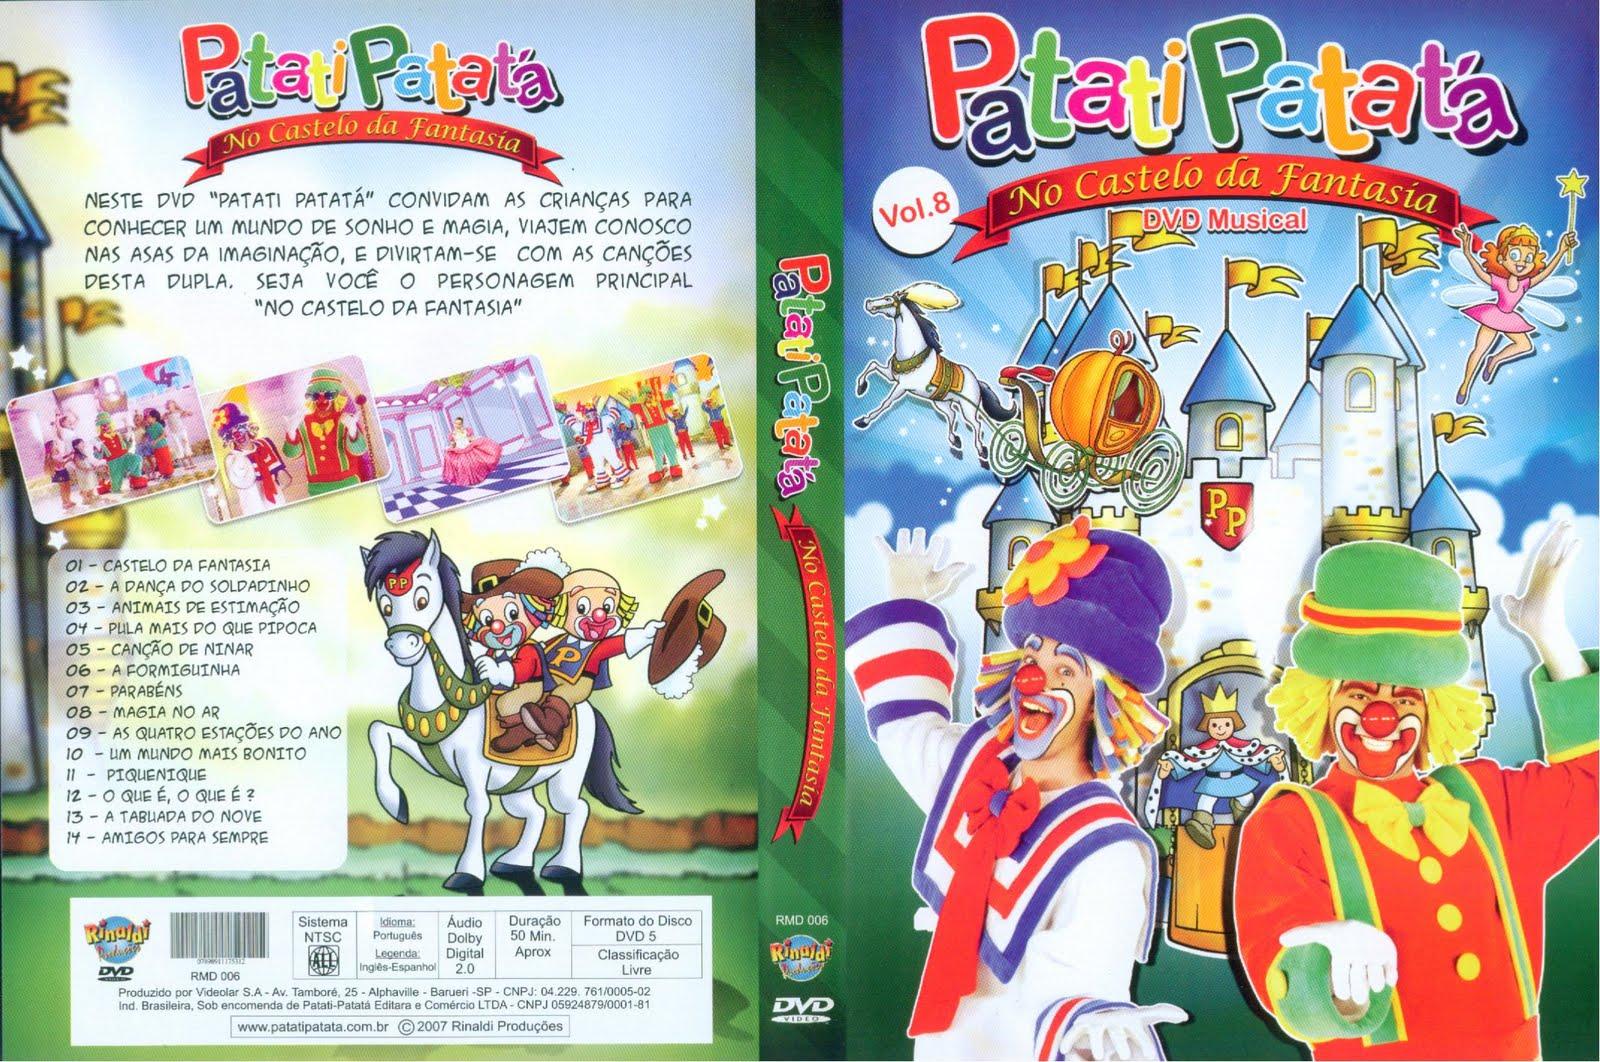 dvd do patati patata 2011